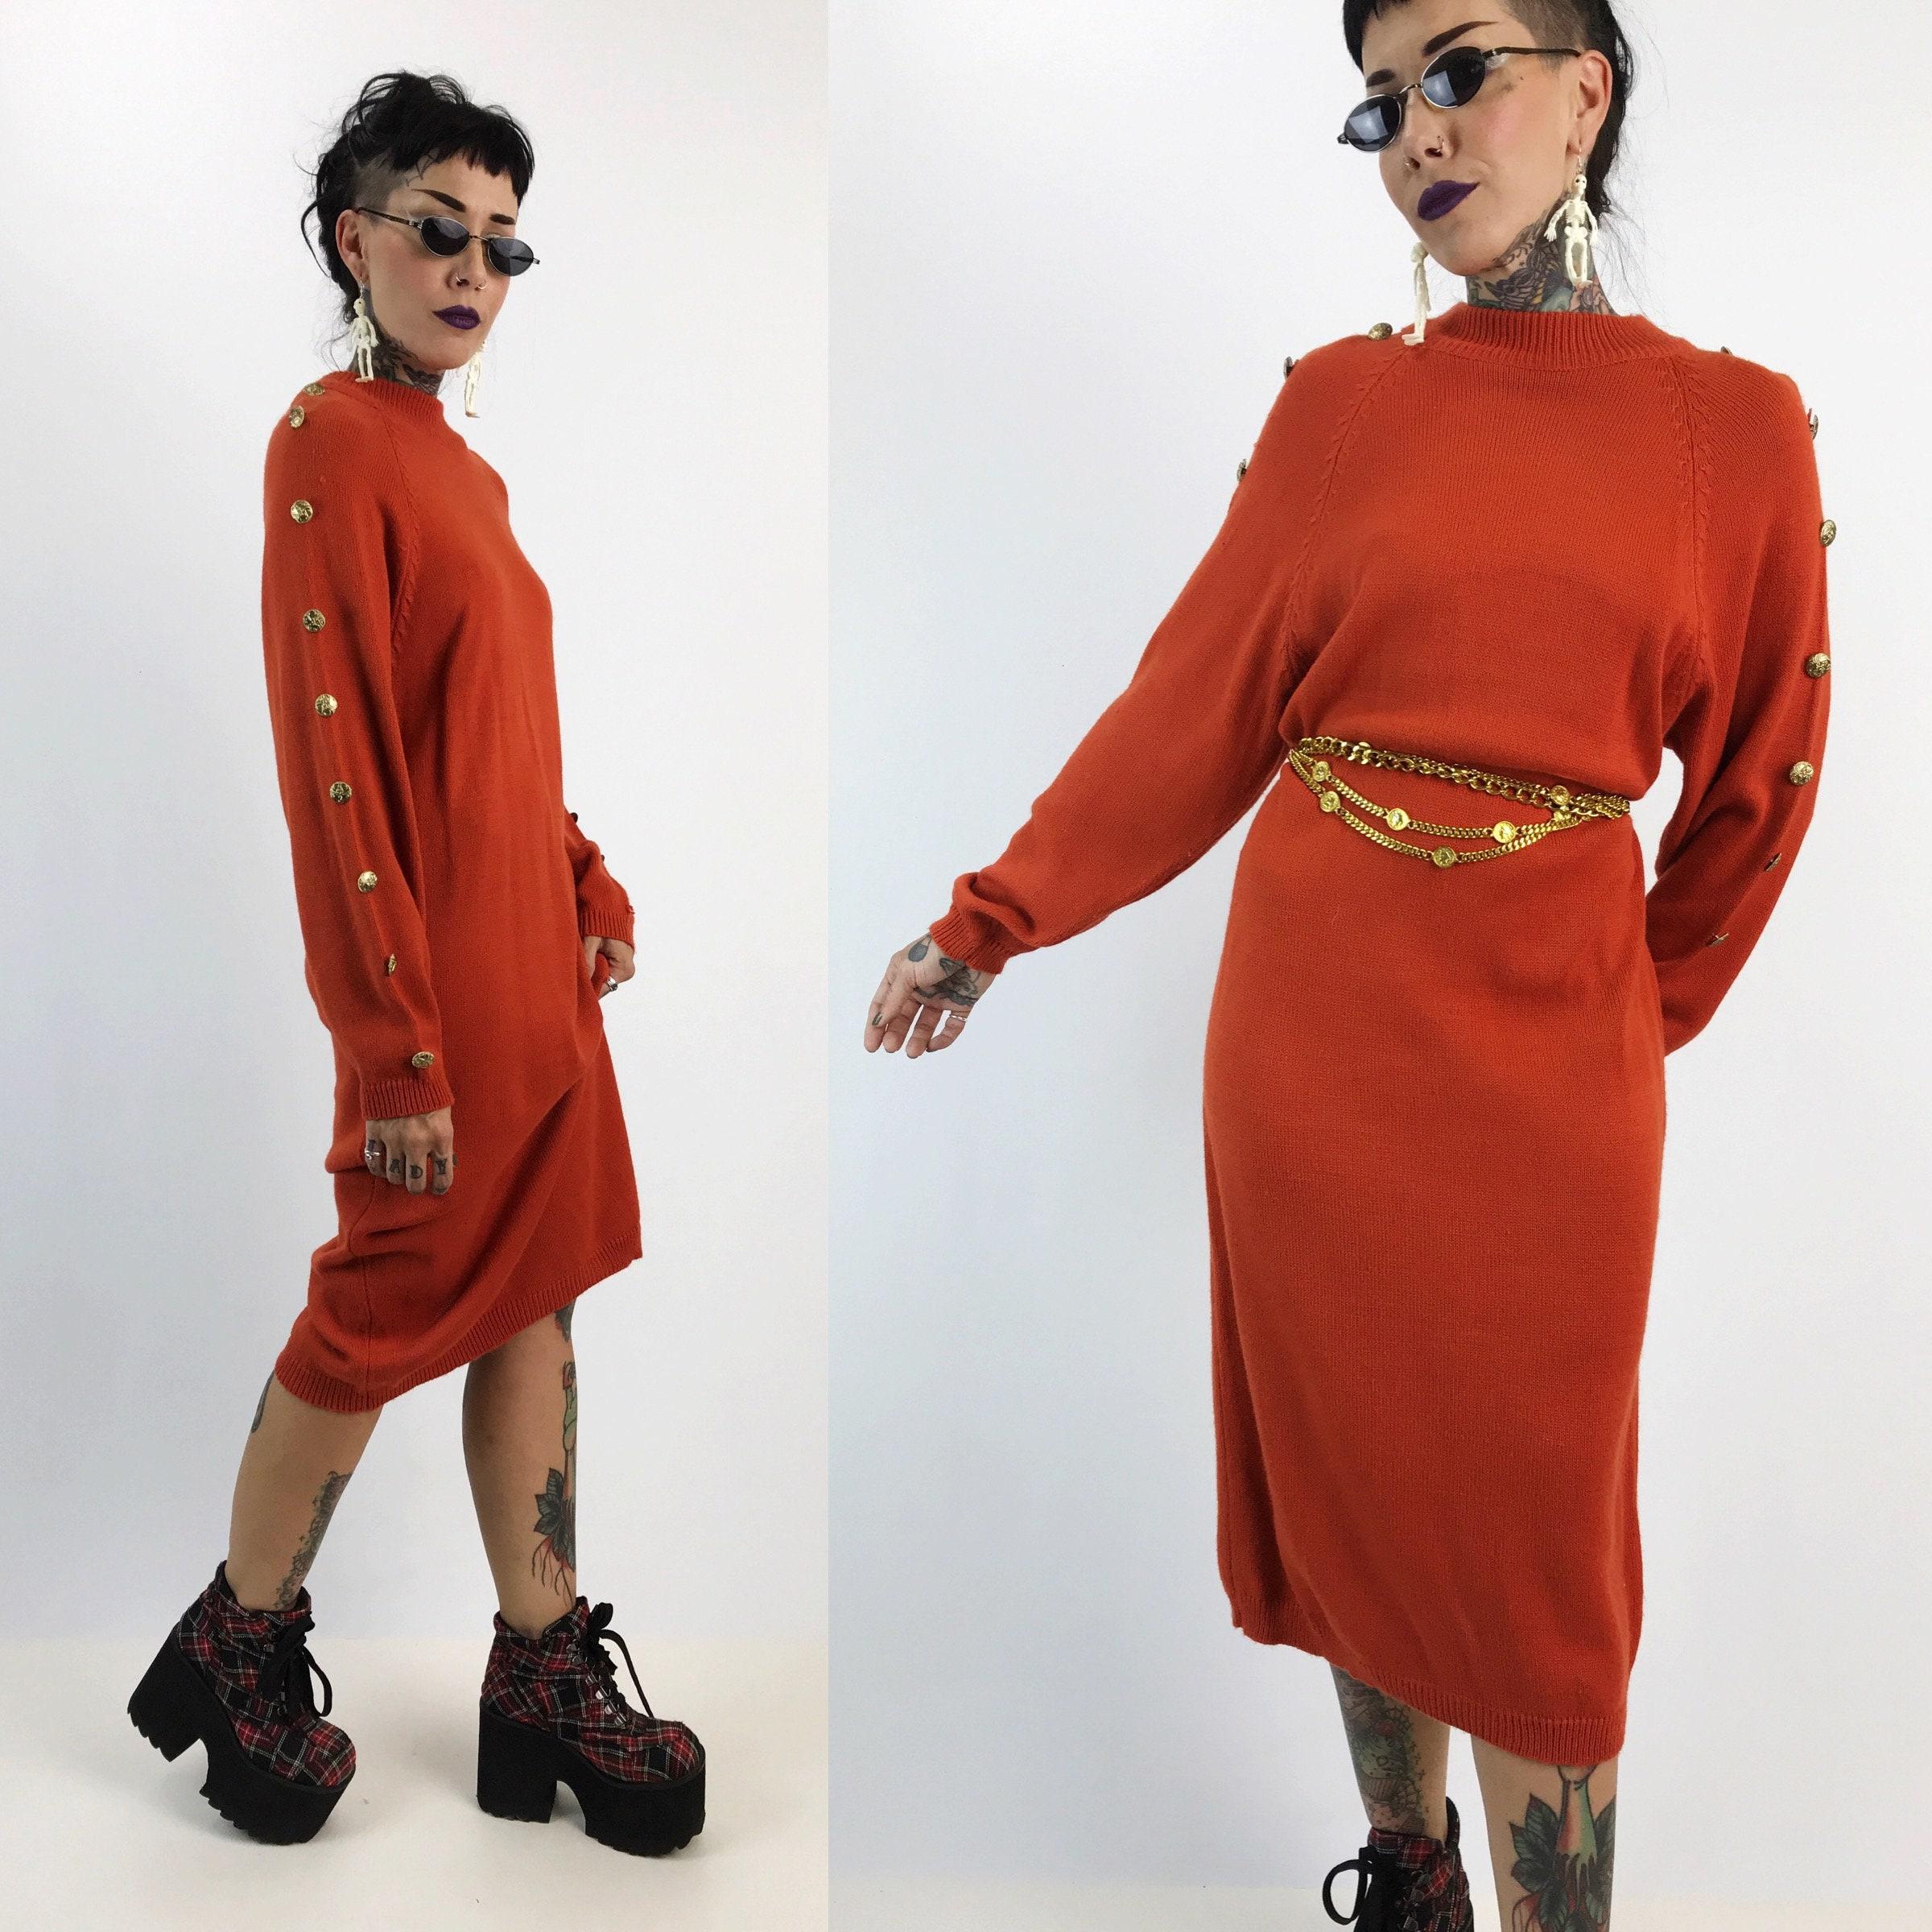 9263d556278b ... Dress Long Sleeve Rust Orange Thick Knit Long Sweater. gallery photo ...